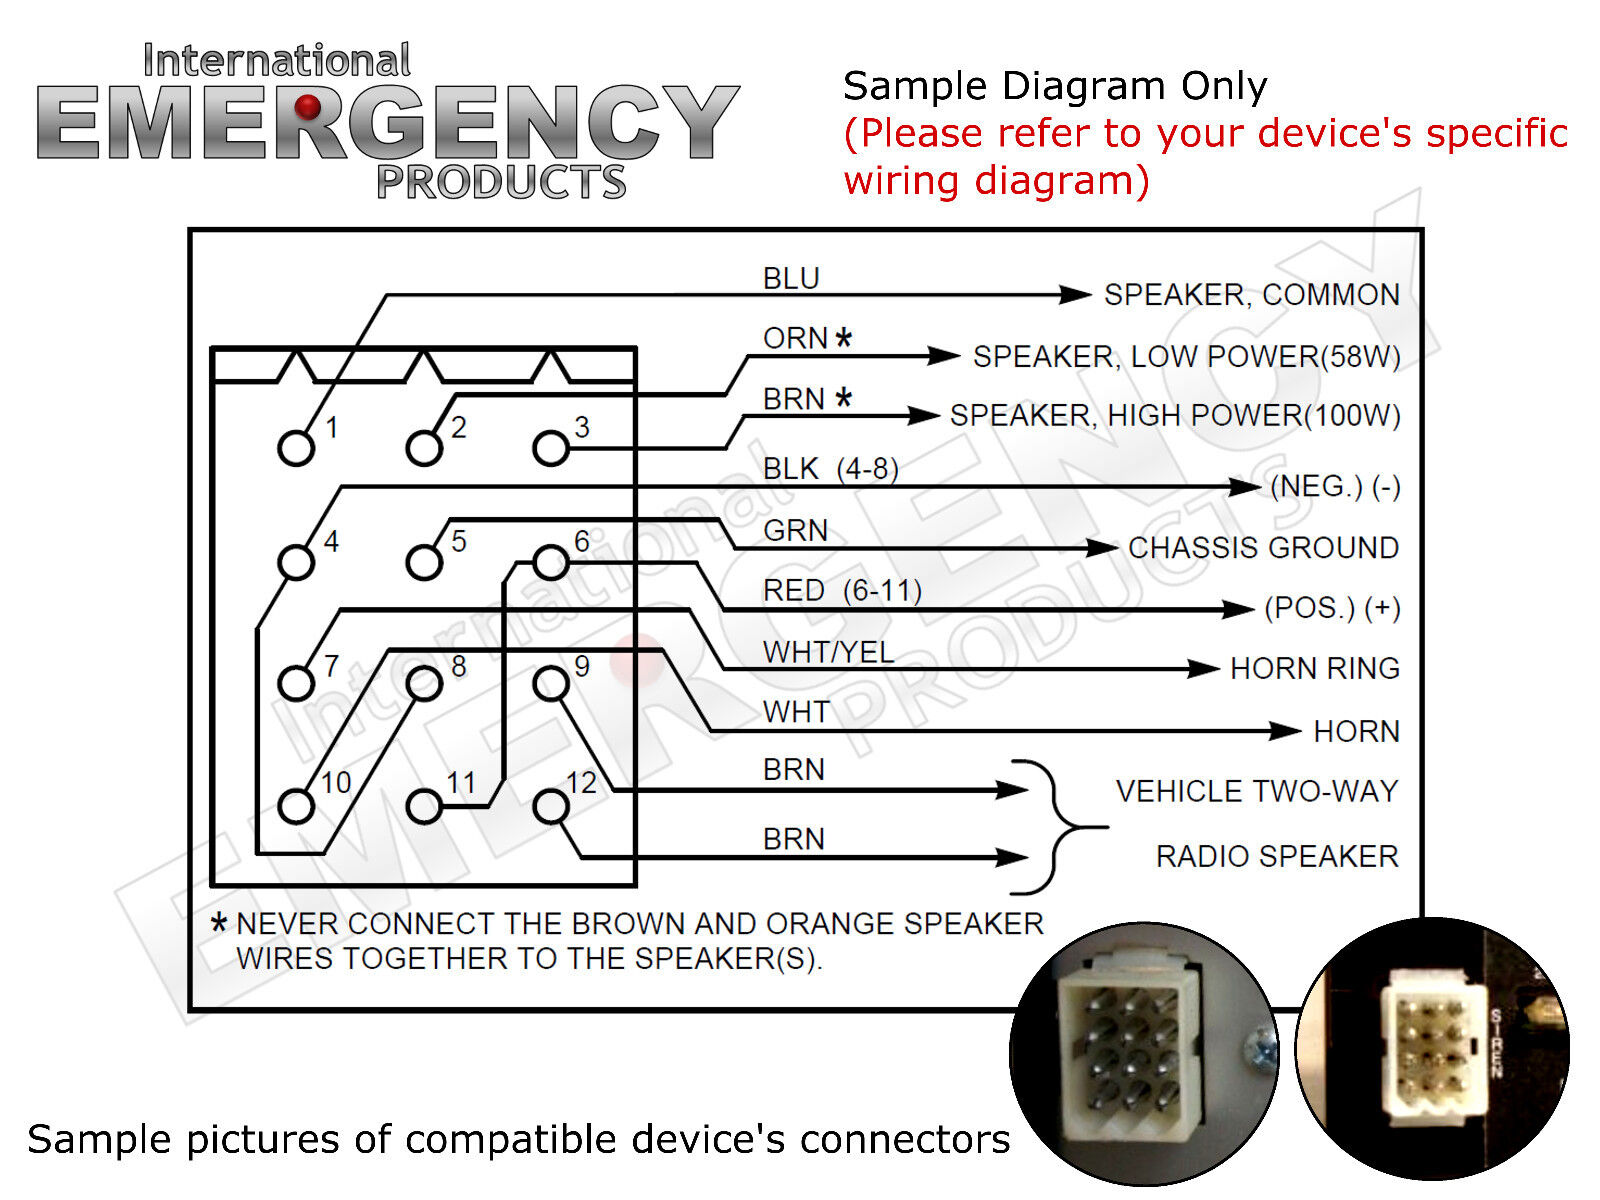 federal pa300 siren wiring diagram a44d73 federal pa300 siren wiring diagram wiring resources  federal pa300 siren wiring diagram